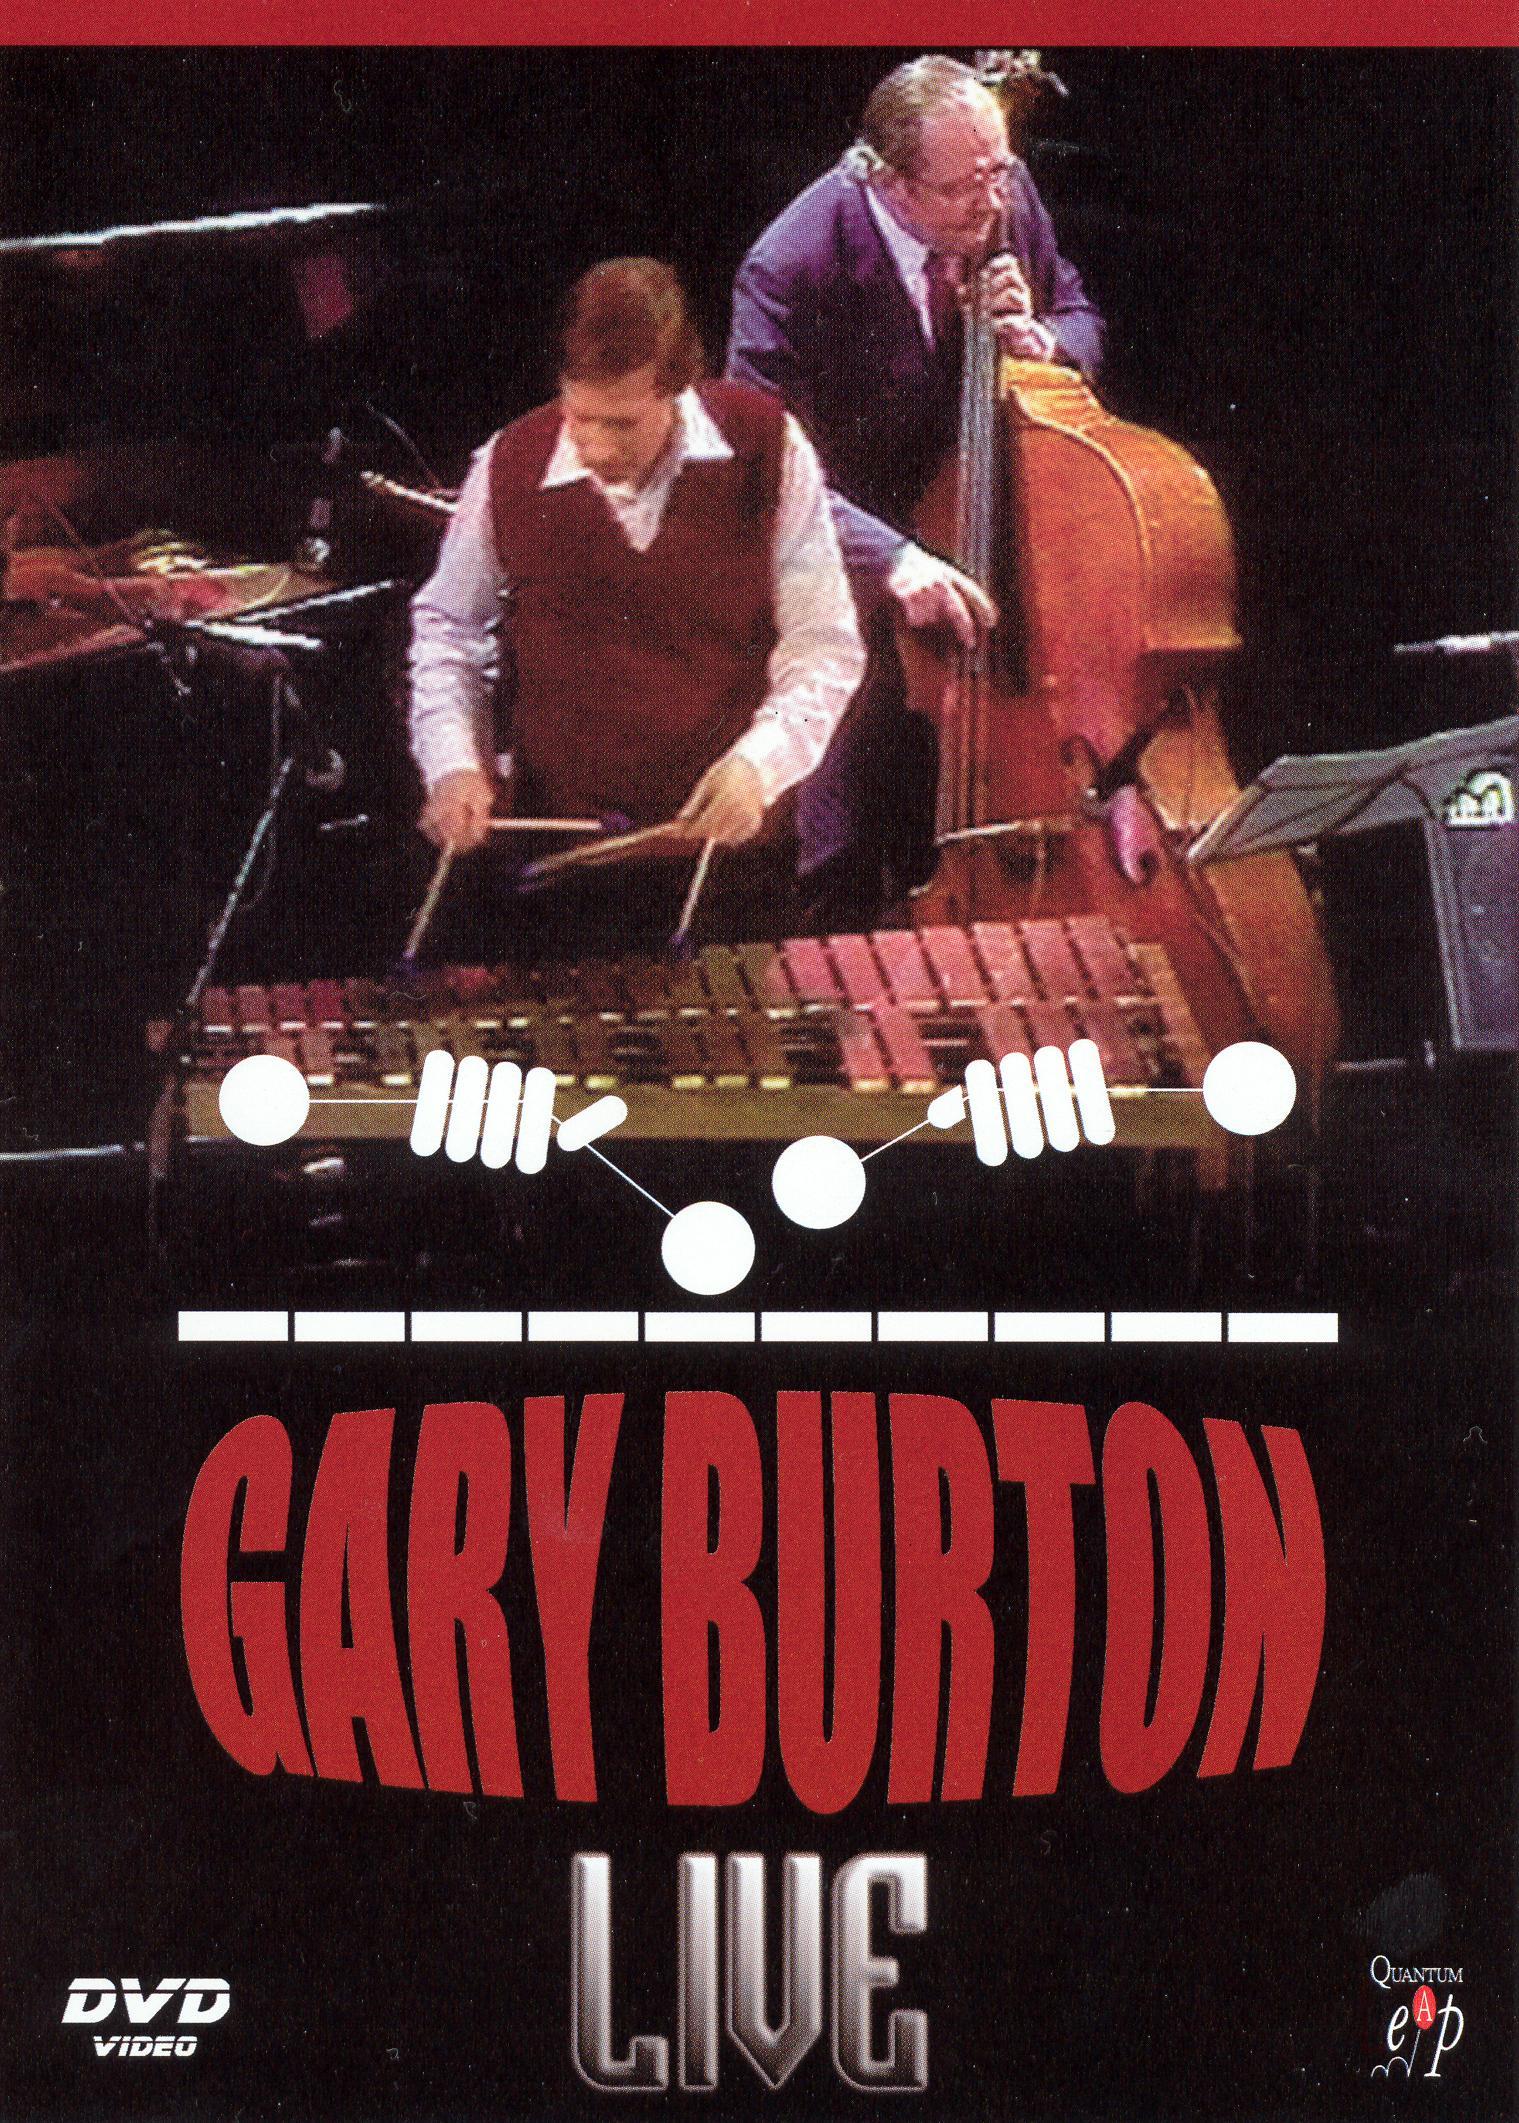 Gary Burton Live